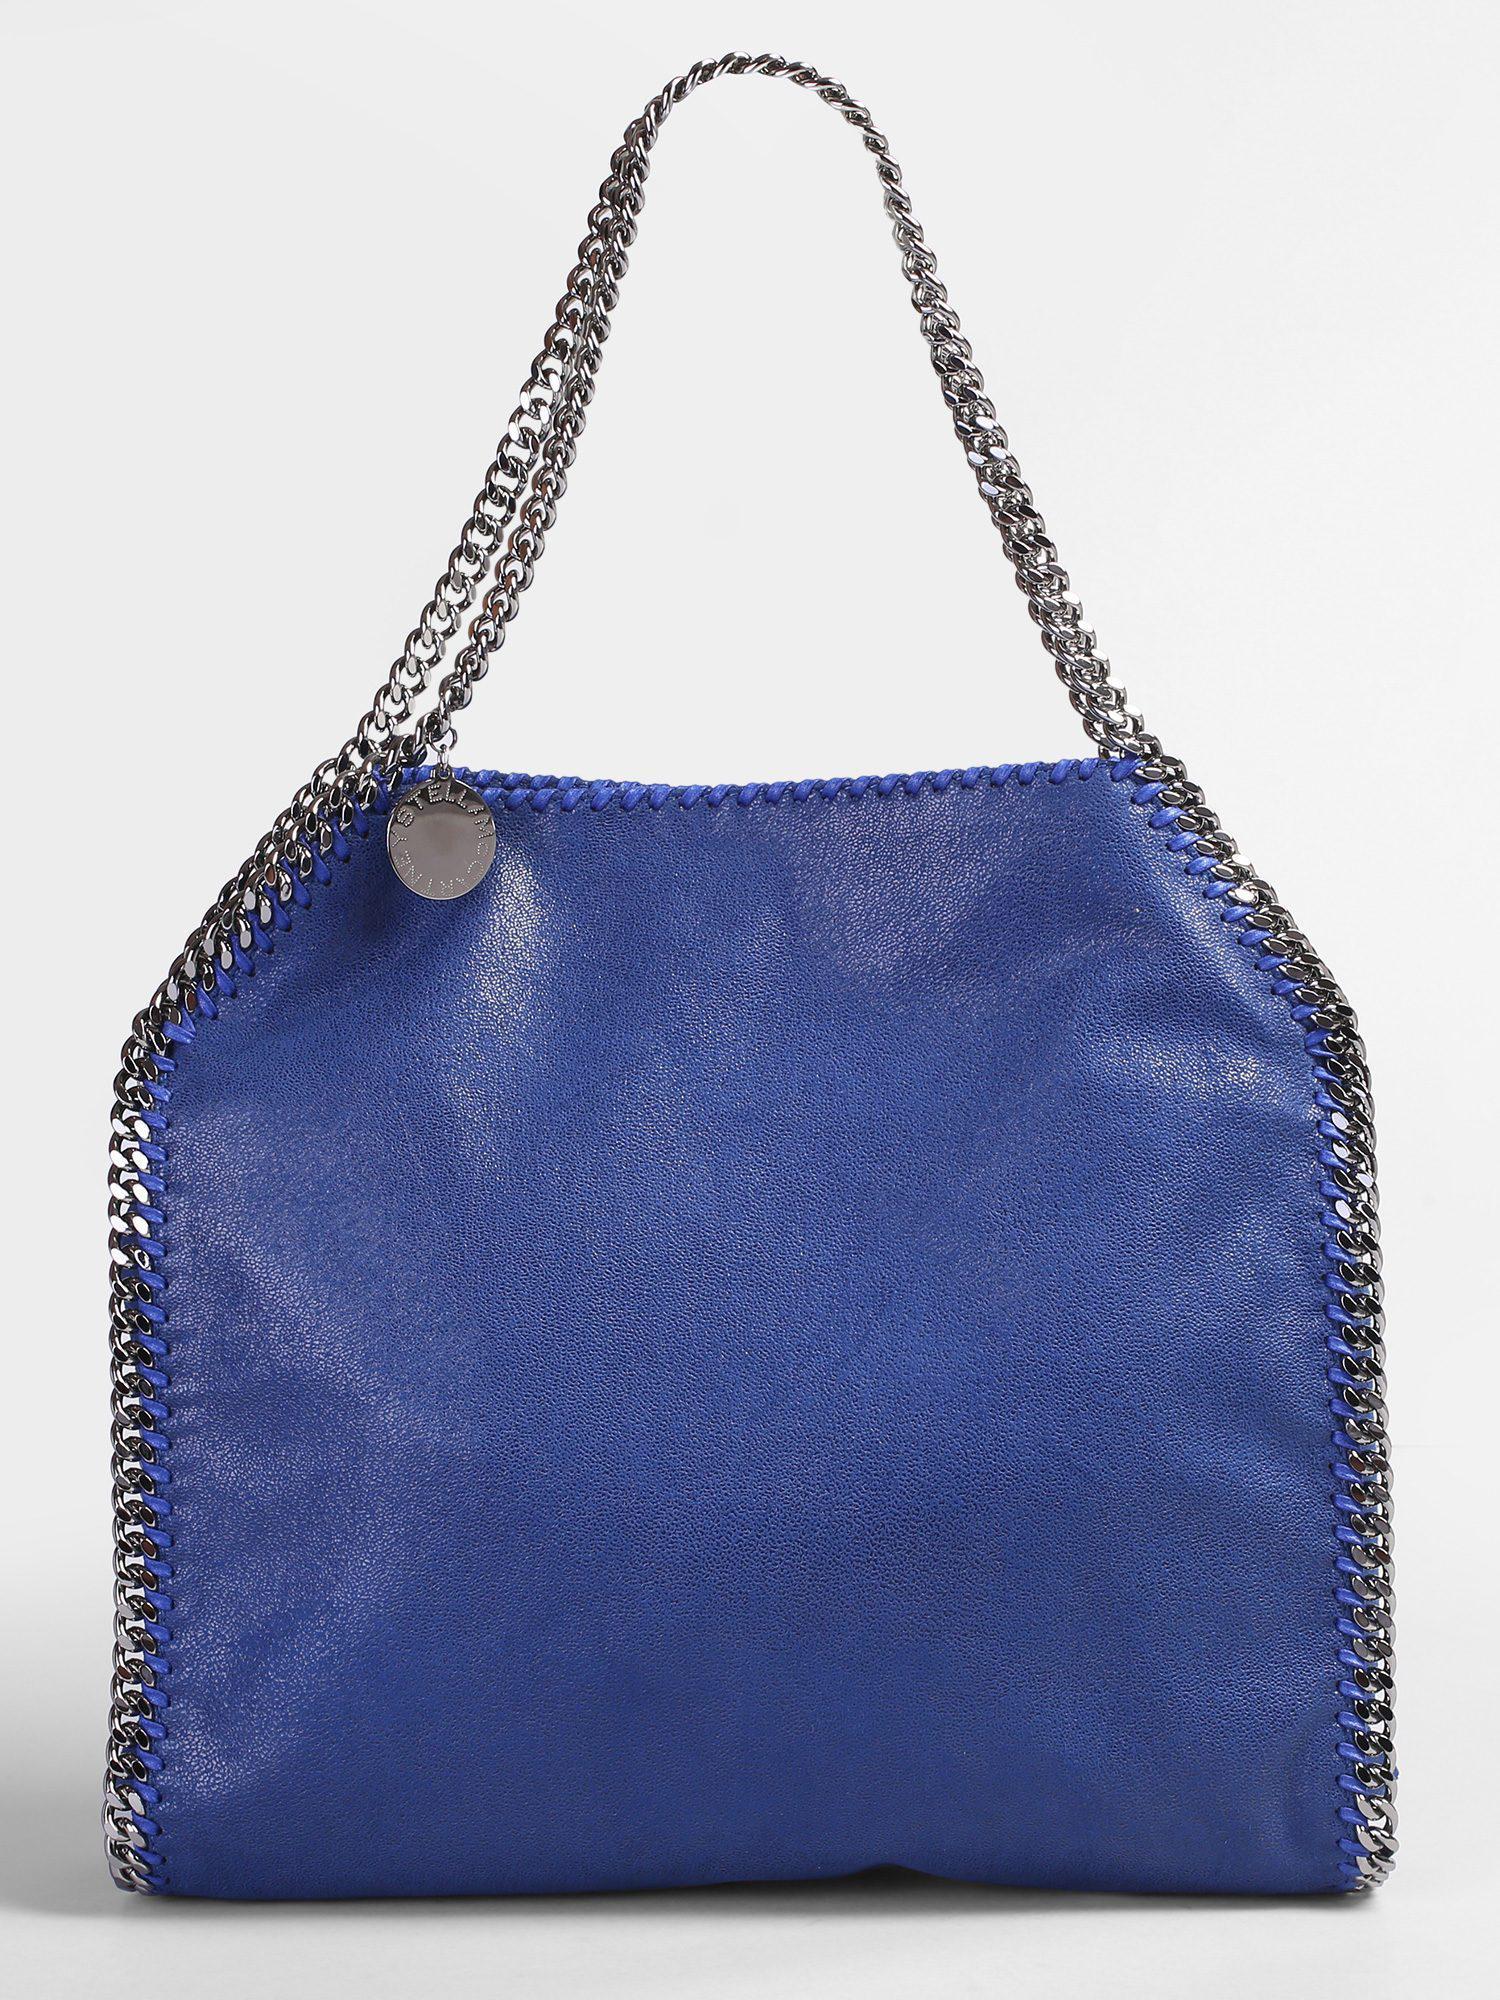 Stella McCartney. Women s Blue Falabella Small Double Chain Faux Leather  Tote c54b59f7b4385